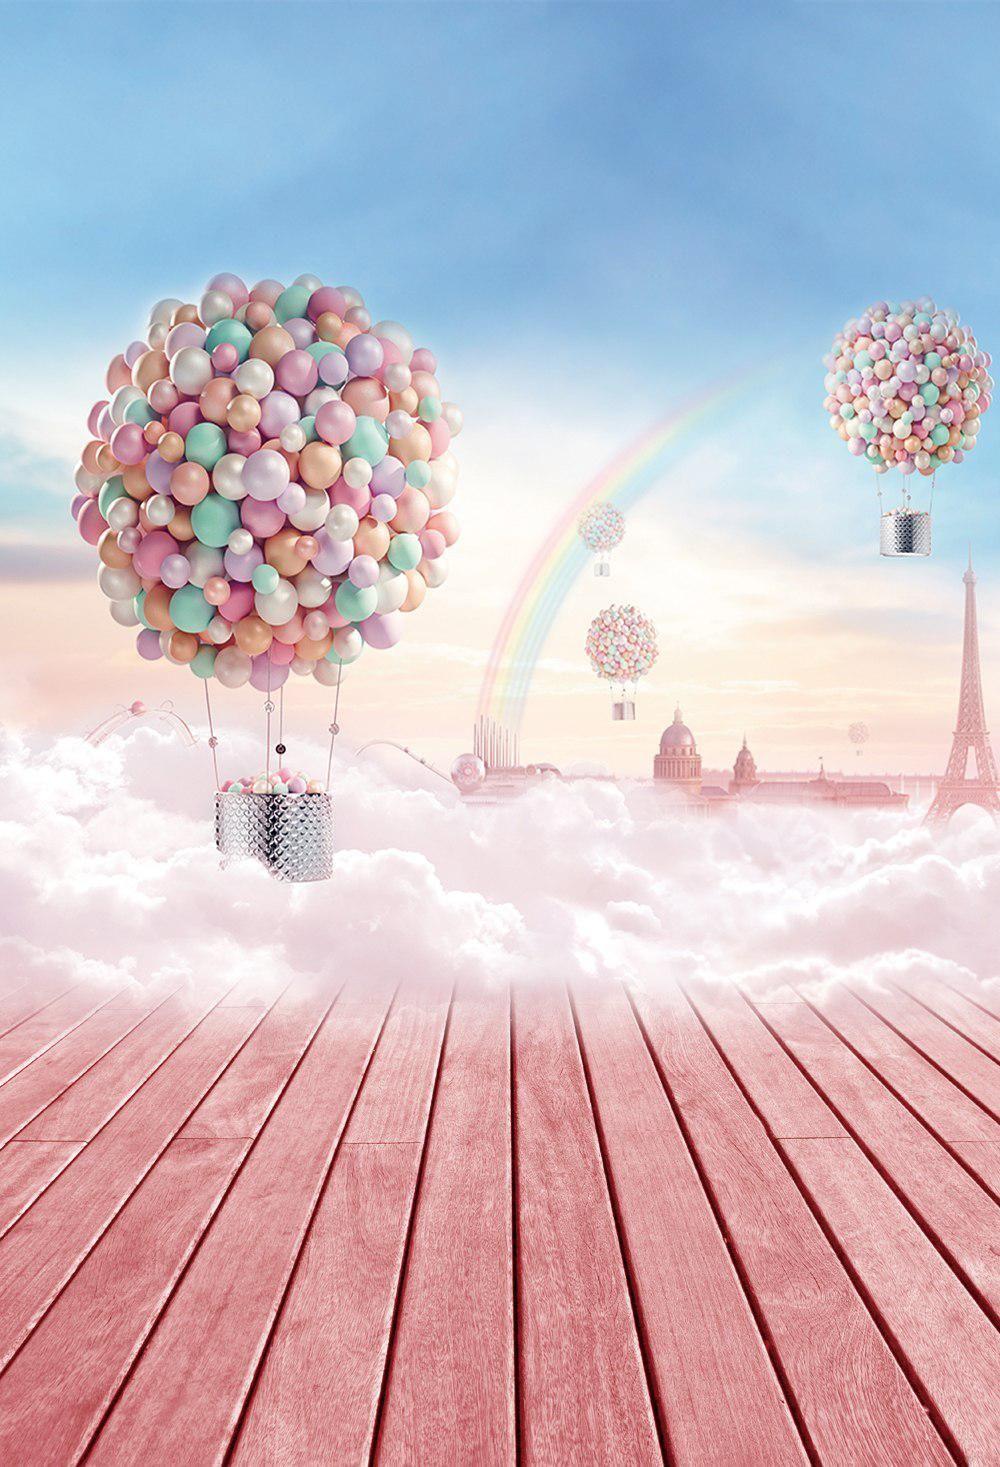 HUAYI Hot Air Balloon Backdrop Photography Backdrops Vinyl